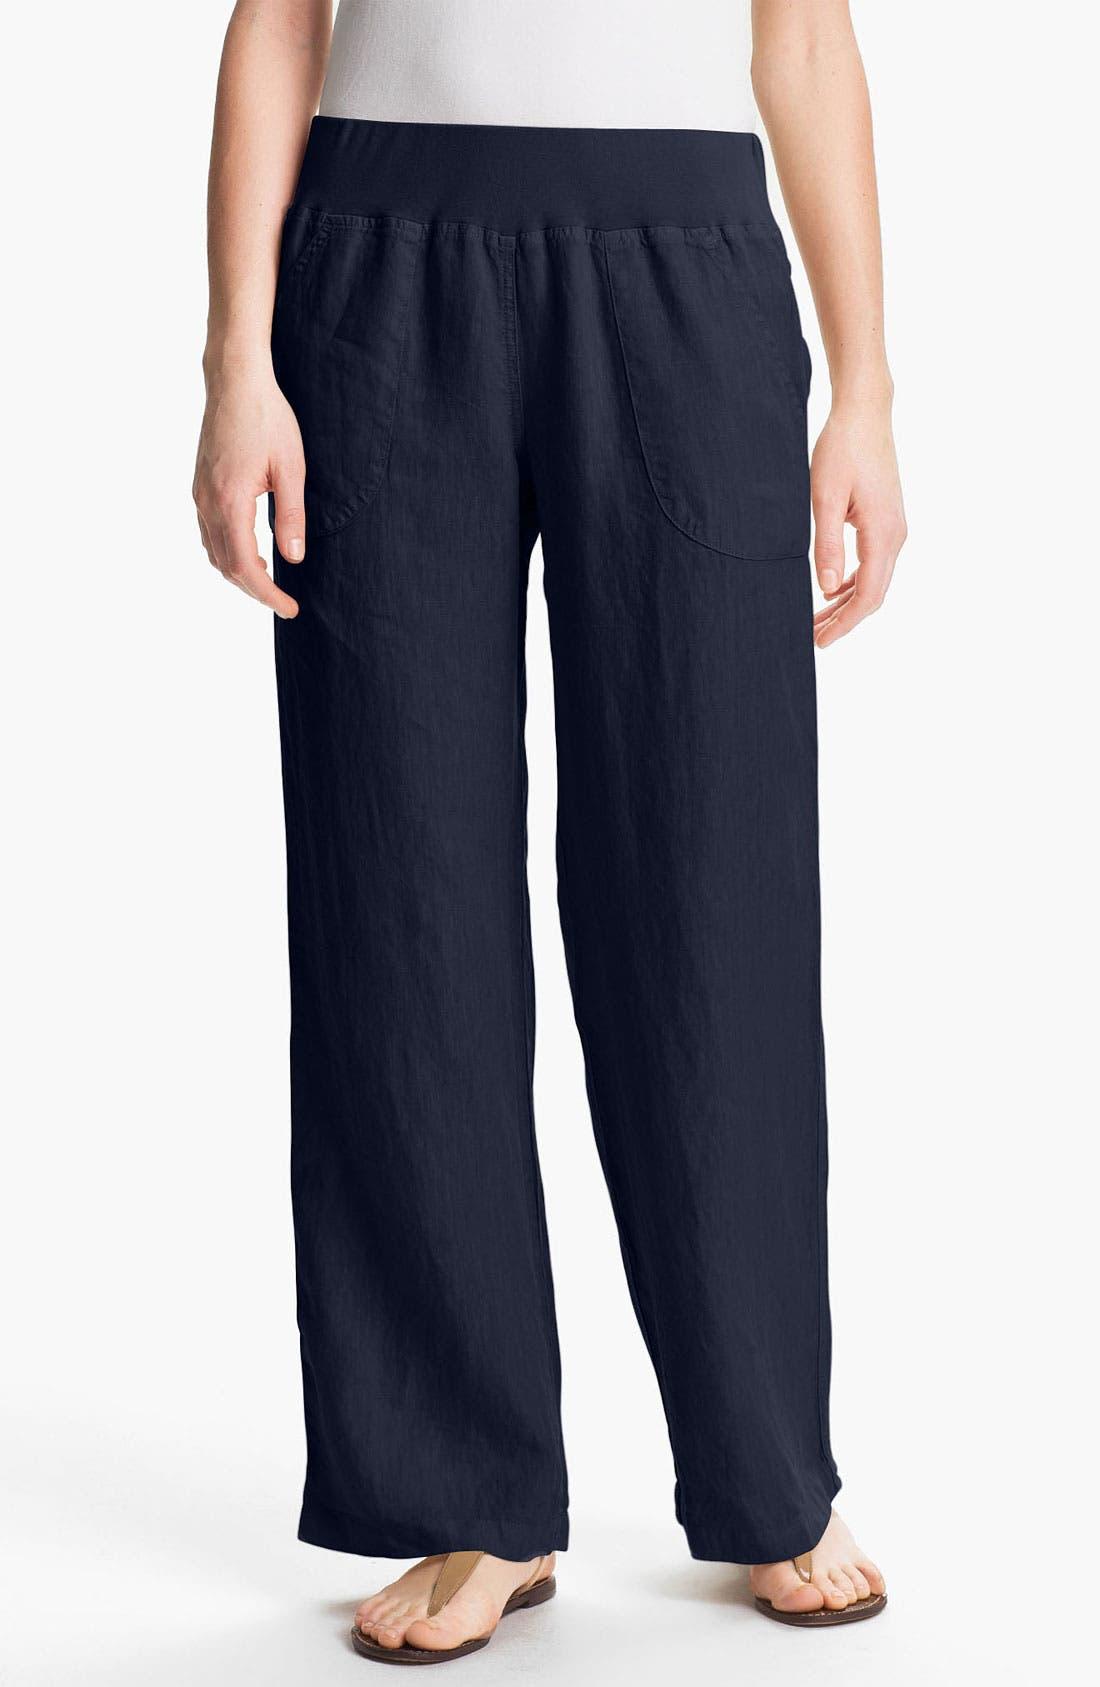 Alternate Image 1 Selected - Nicki & Bell Rib Waist Linen Pants